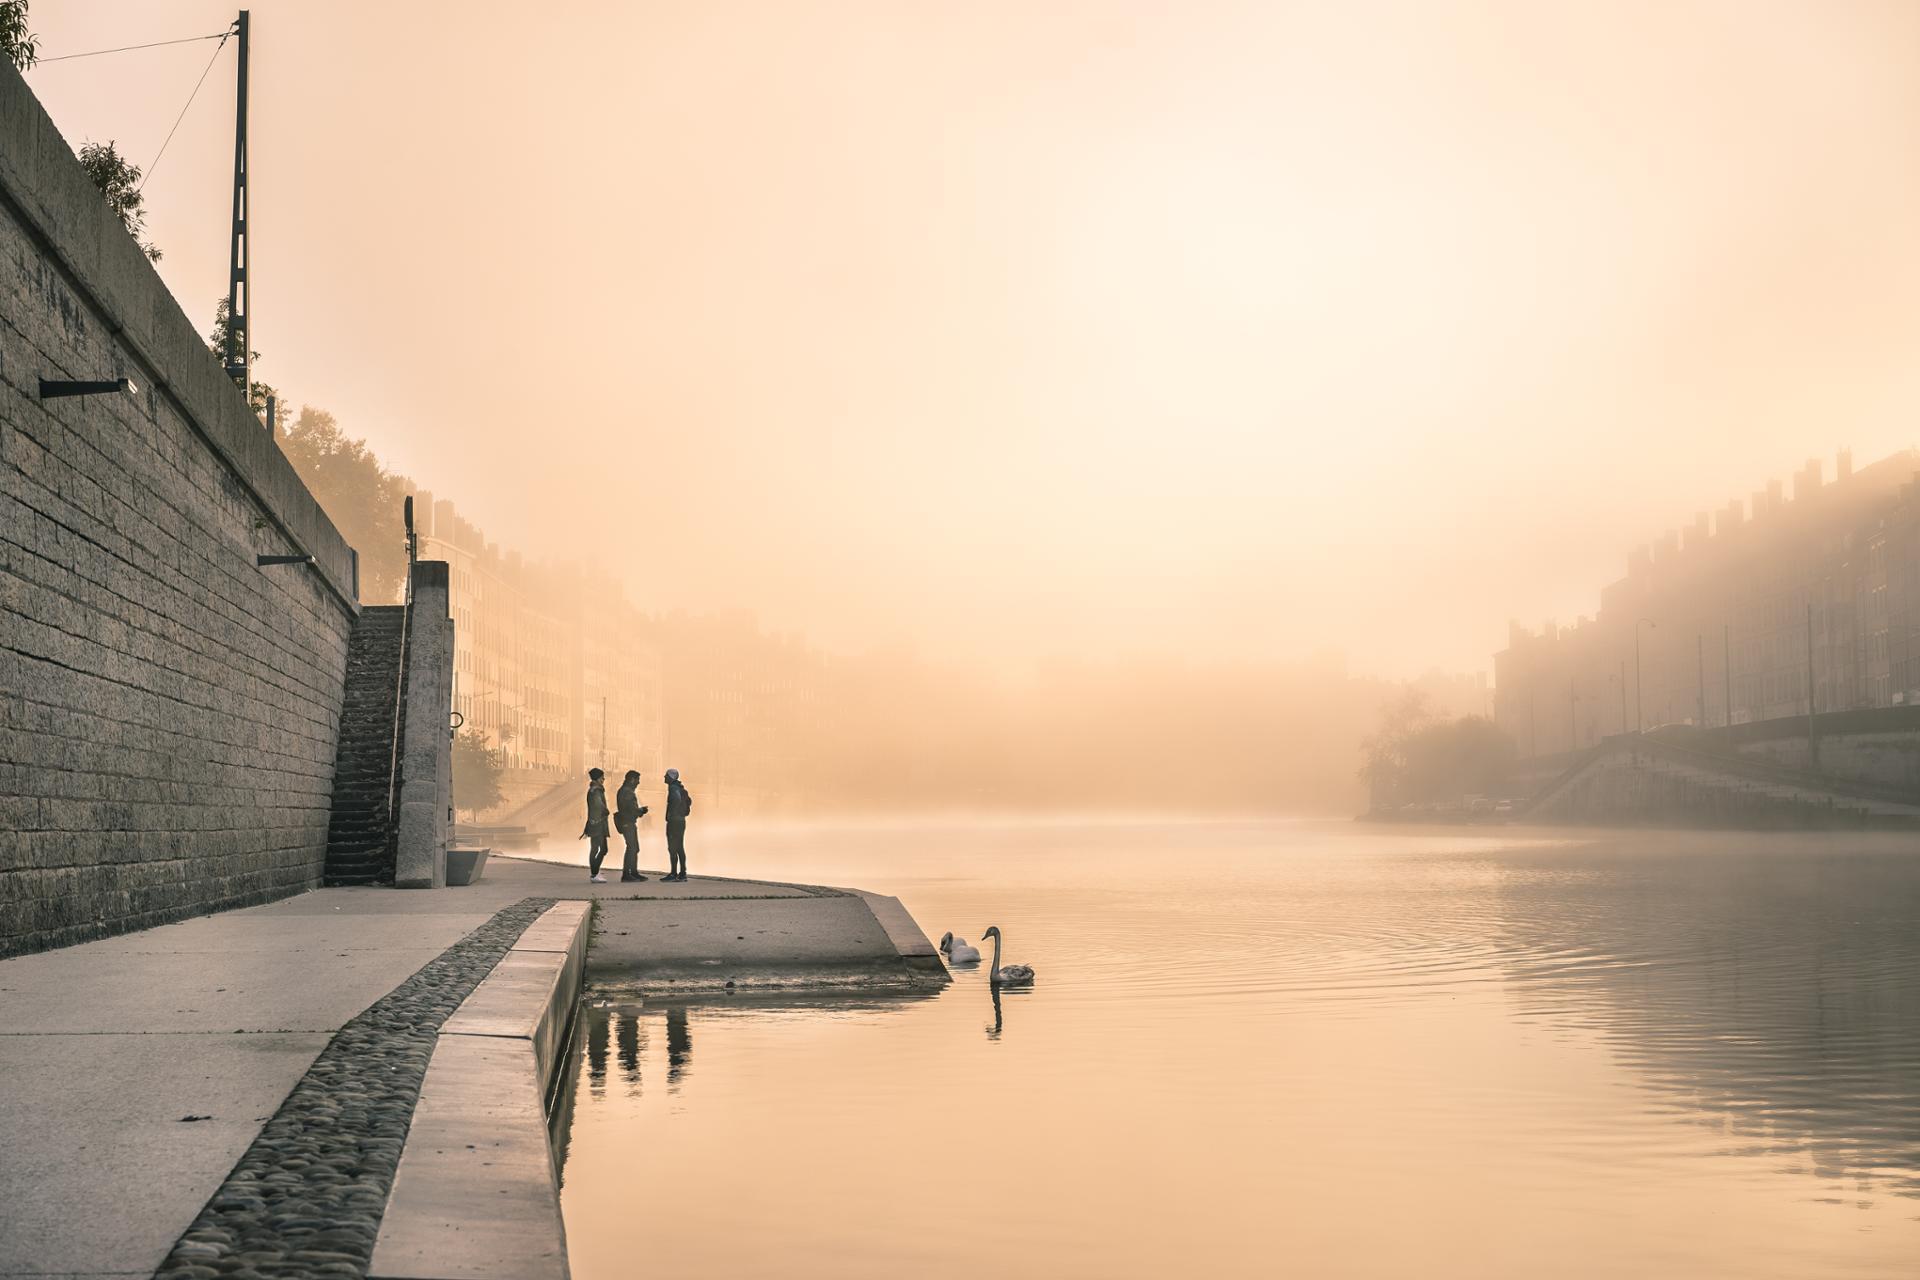 Mist's morning